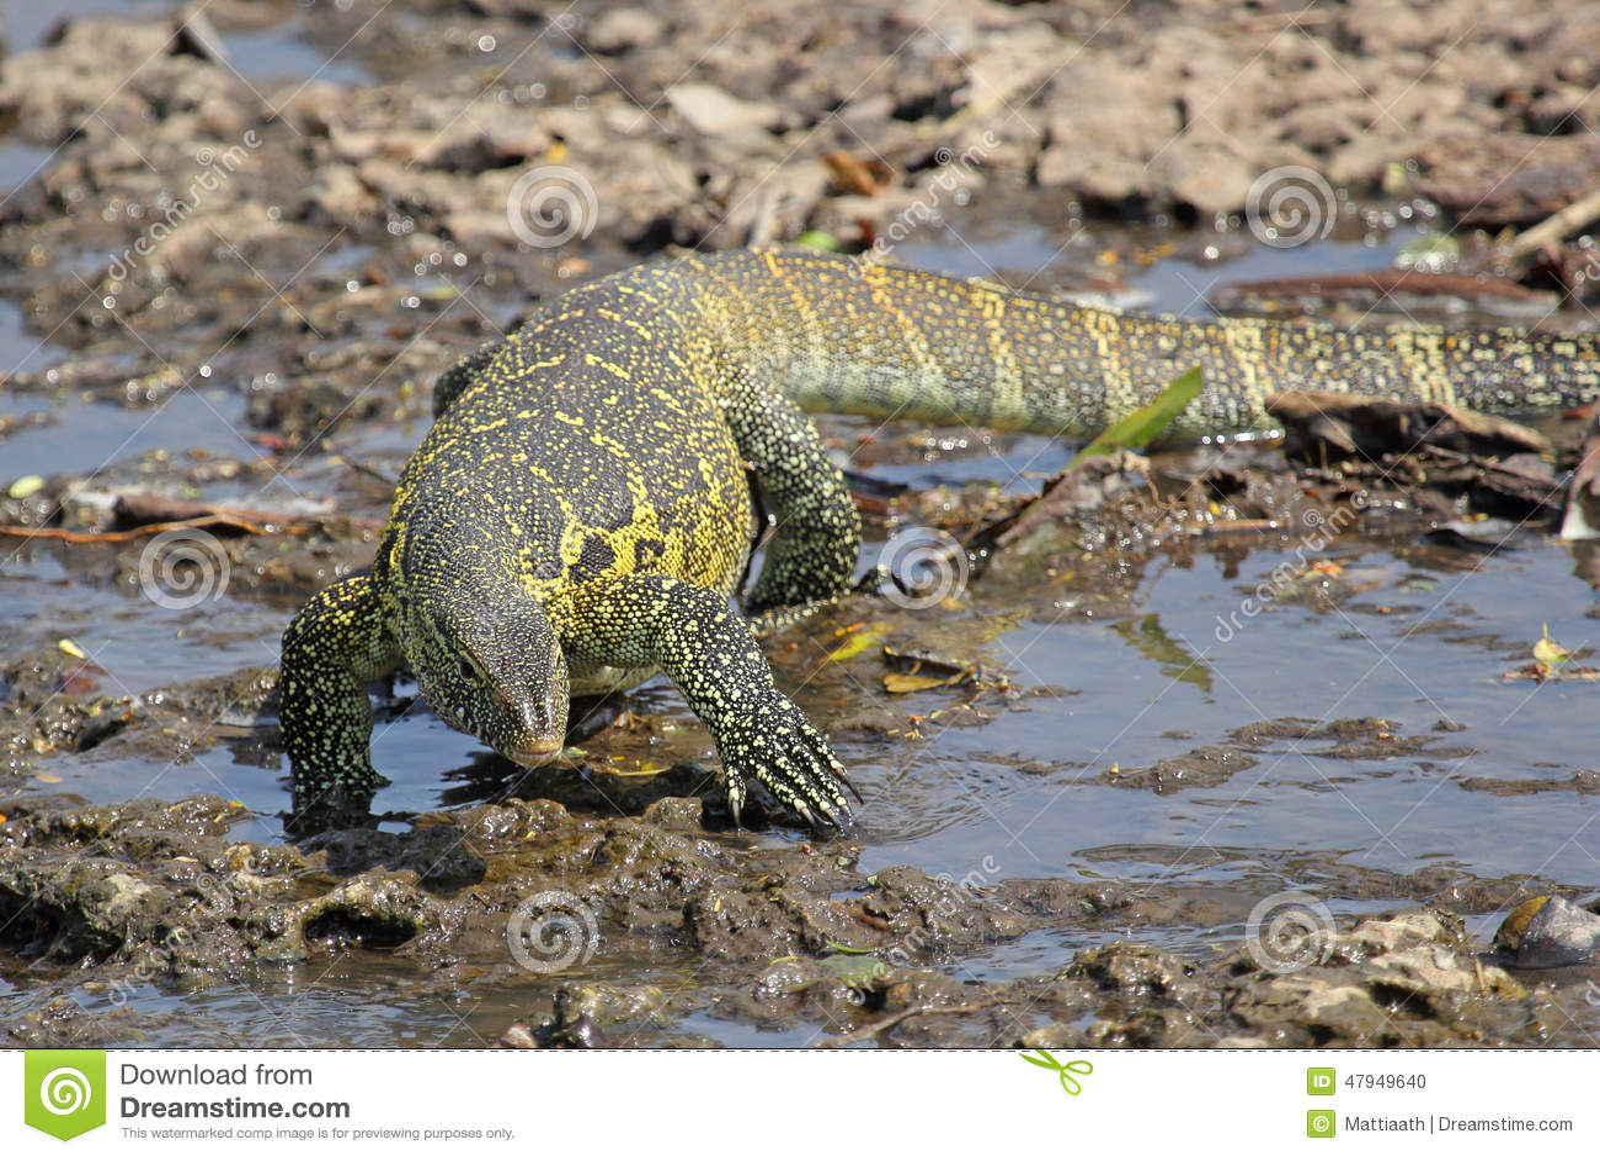 Nile monitor videos photos and facts  Varanus niloticus